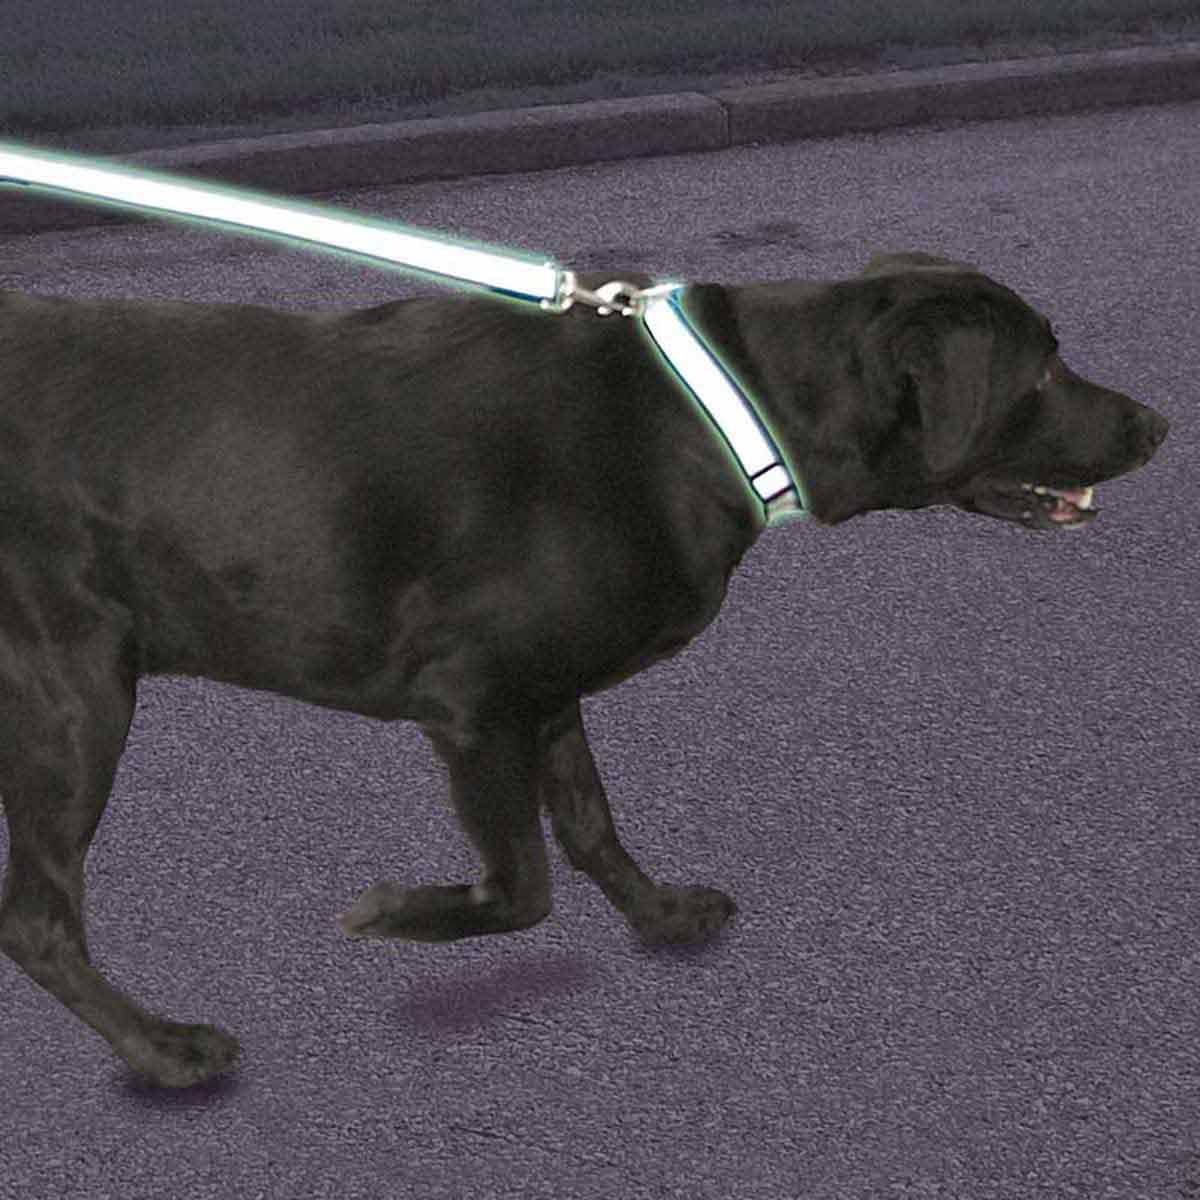 "Example of Dog Walking with Coastal Lazer Brite Reflective 5/8"" Lead 4'"